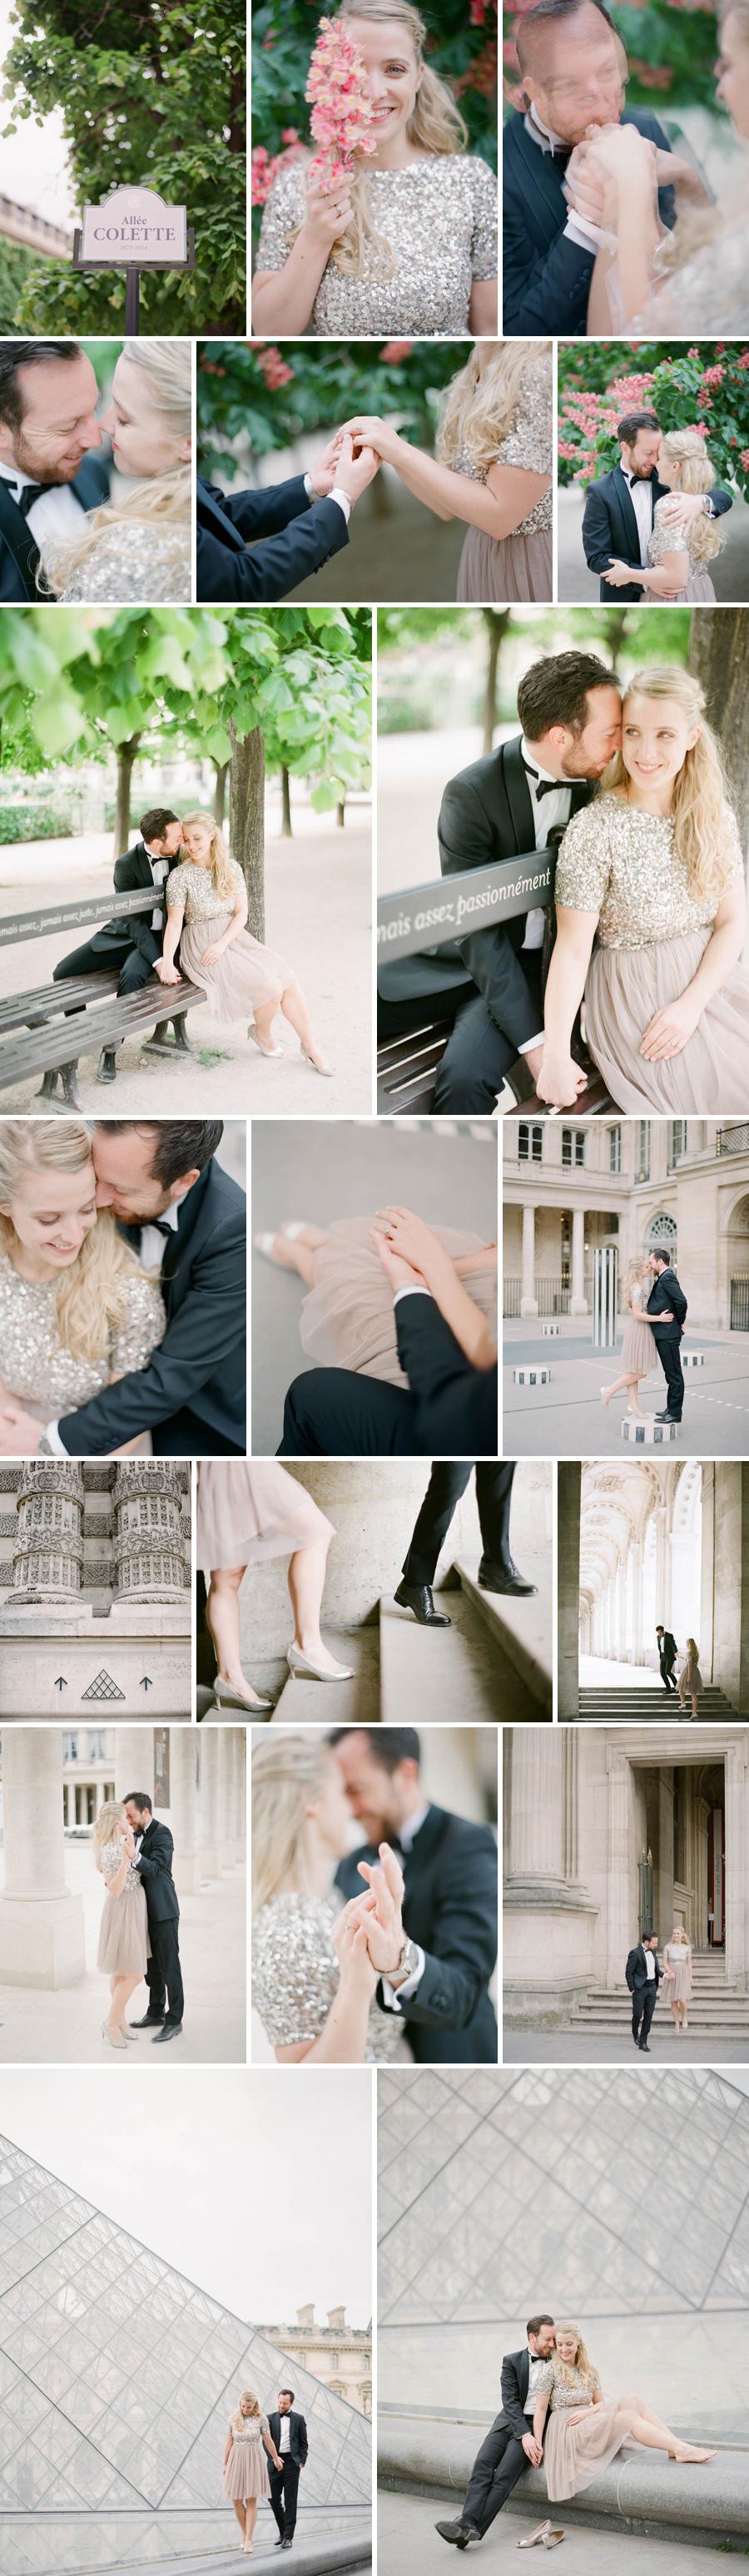 wedding photographer paris louvres palais royal seance photo